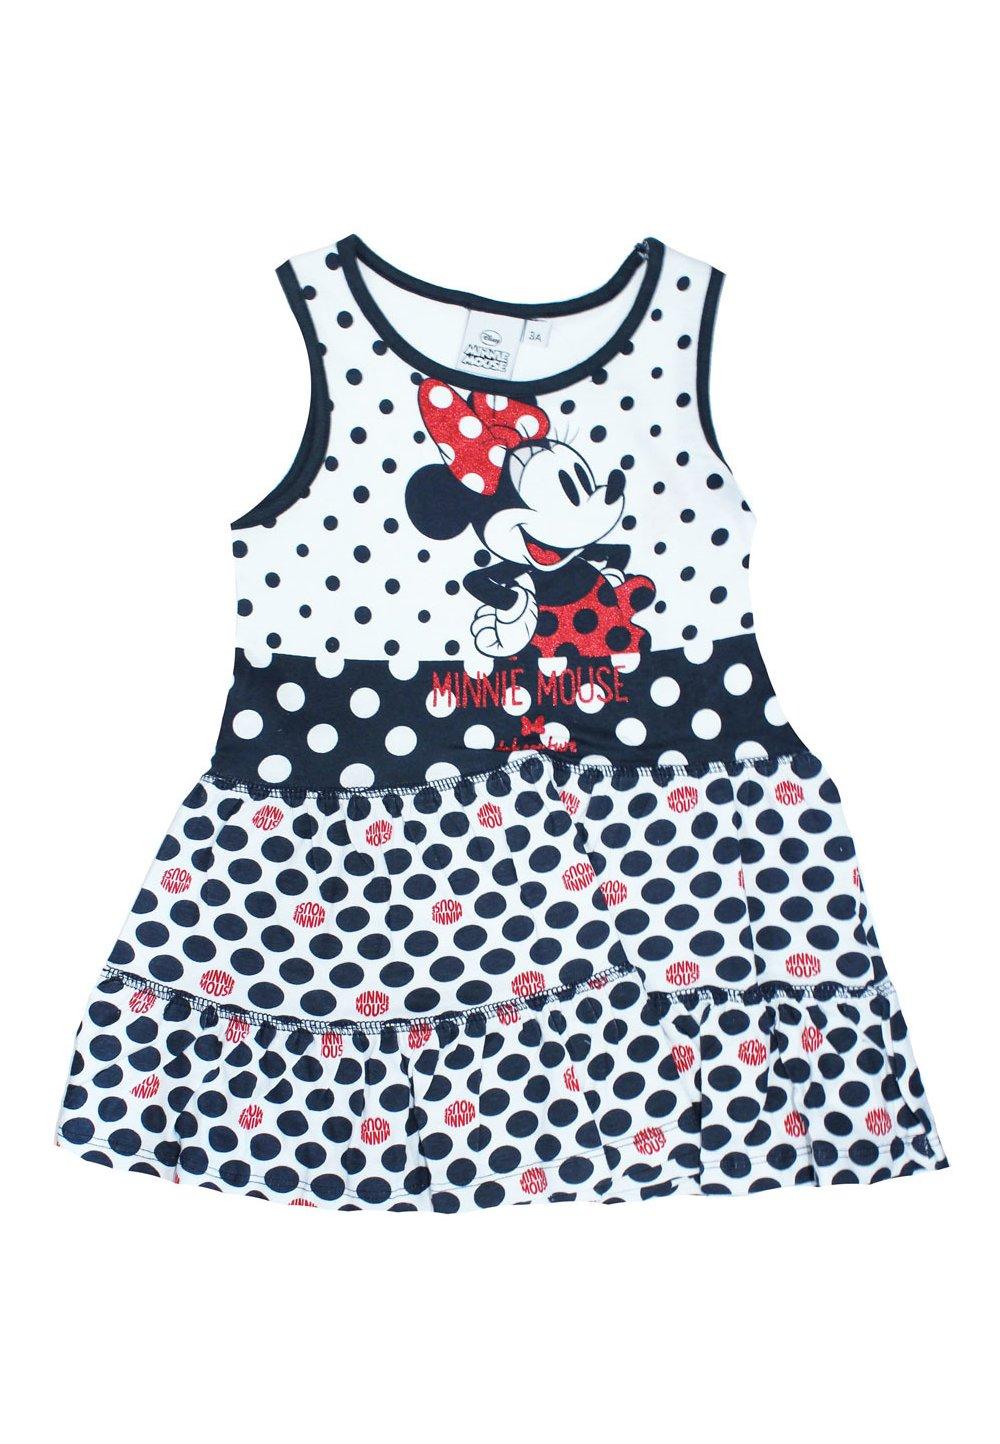 Rochie, bluemarin, cu buline bluemarin, Minnie Mouse imagine